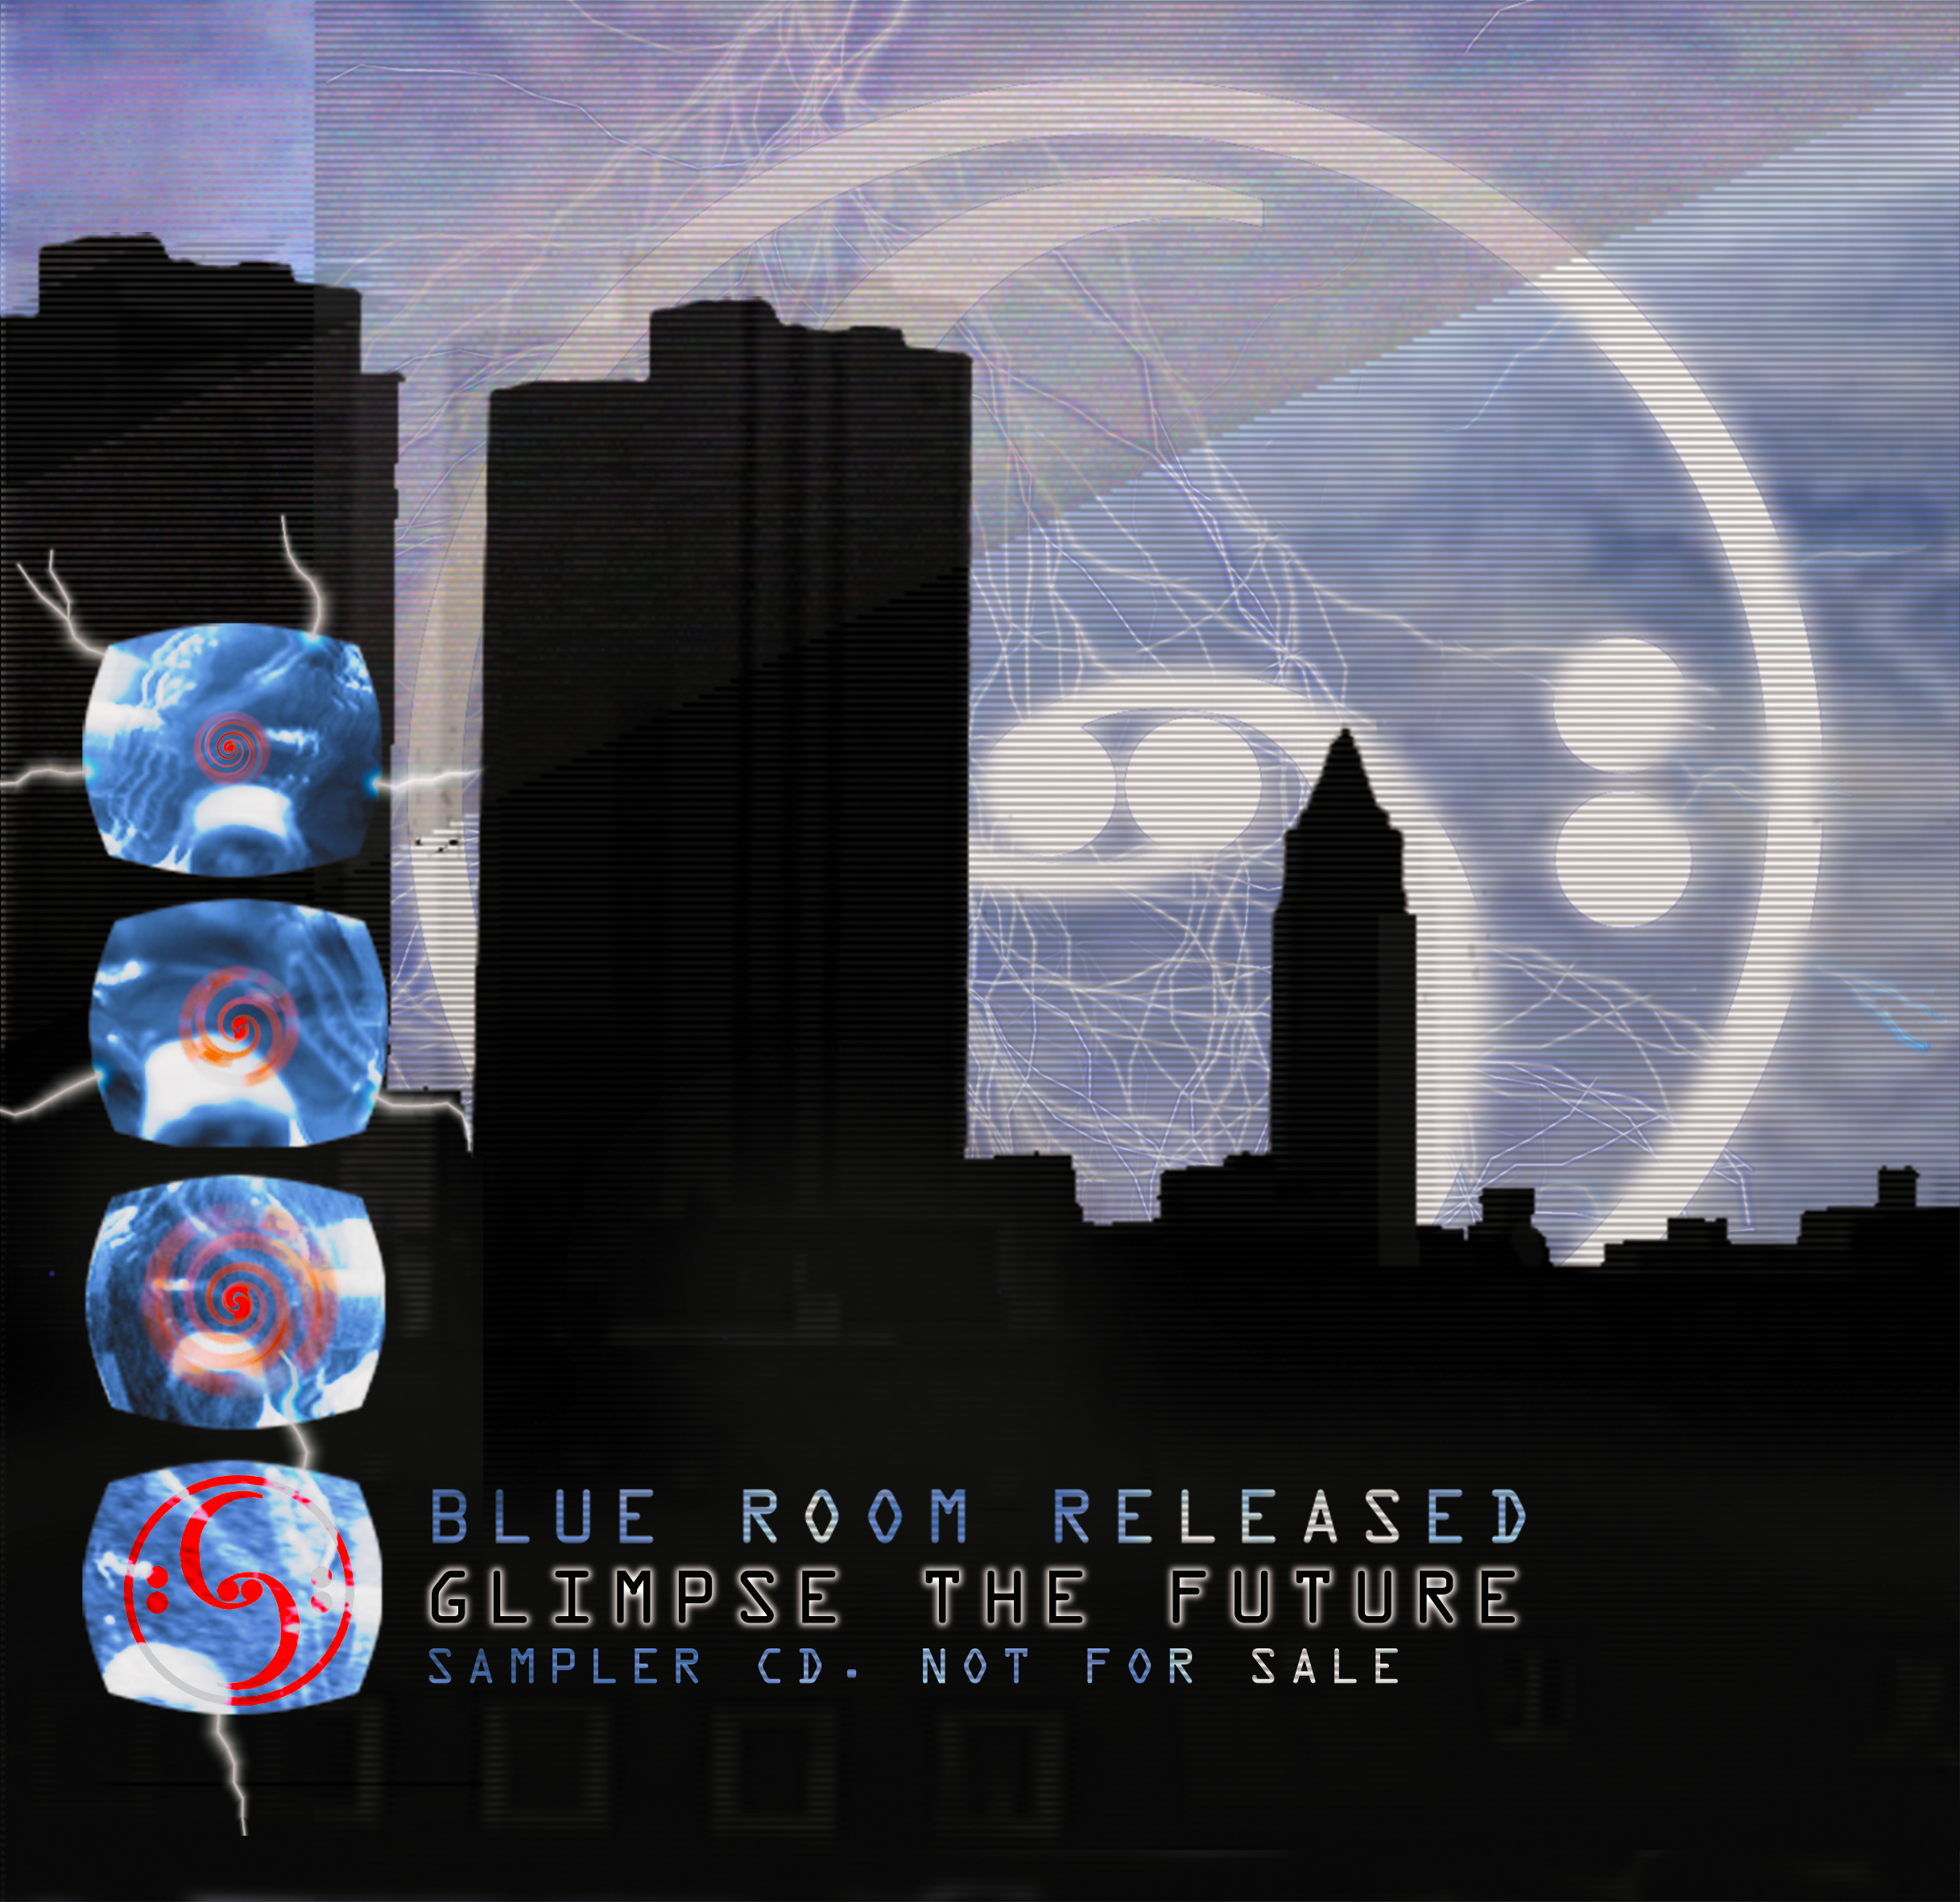 Glimpse The Future - BLUE ROOM RELEASED 1998